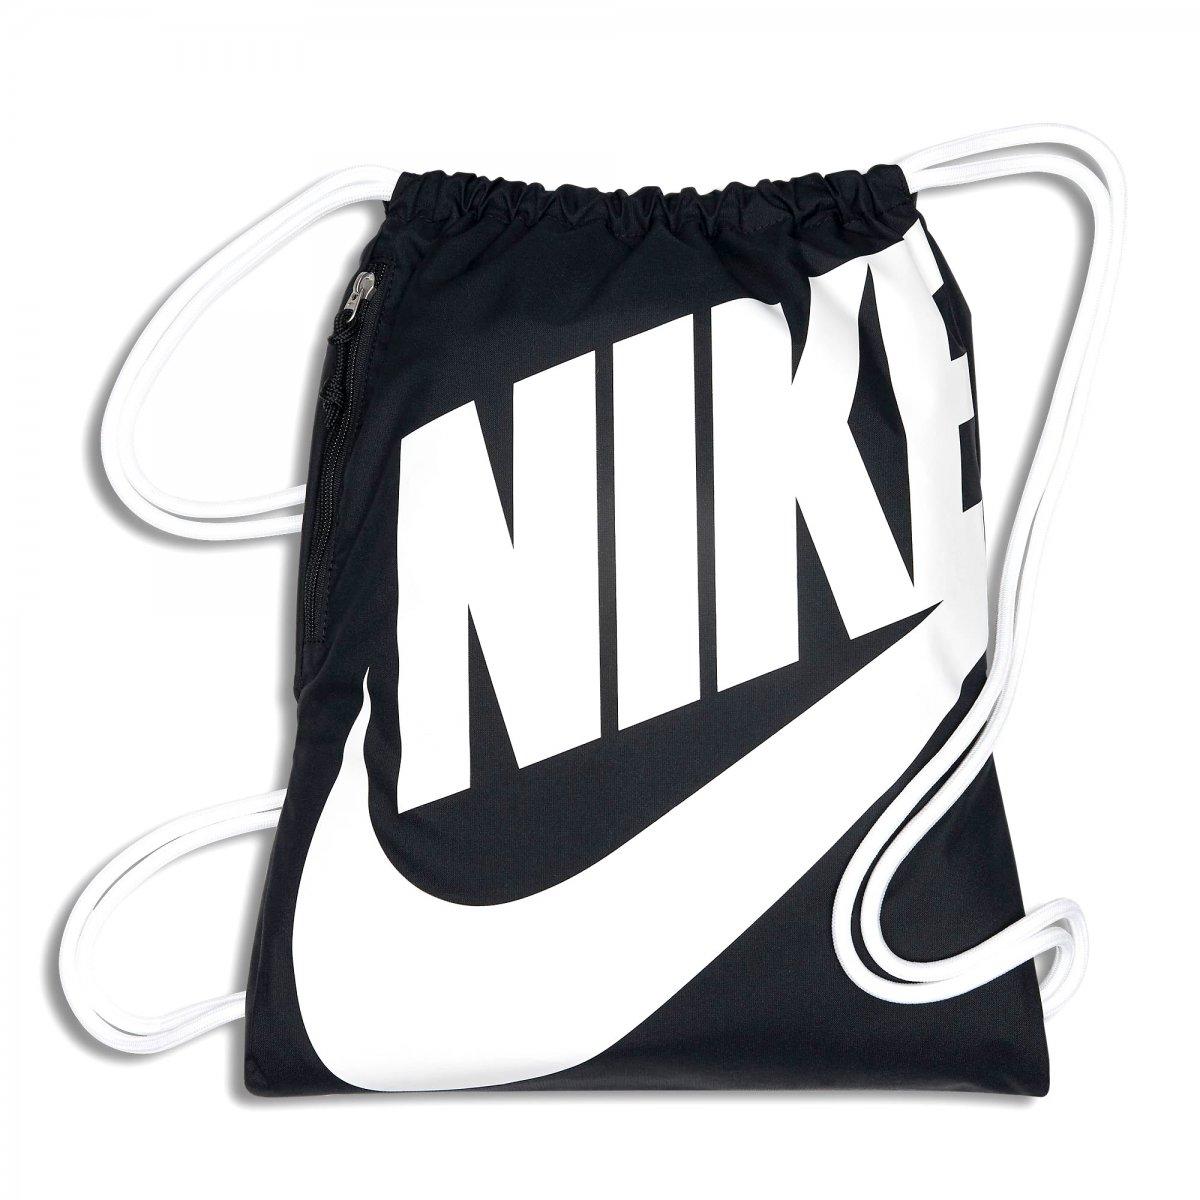 e4d162d7dae77 Saco de Academia Nike Heritage Gym Sack BA5351-011 Preto Branco